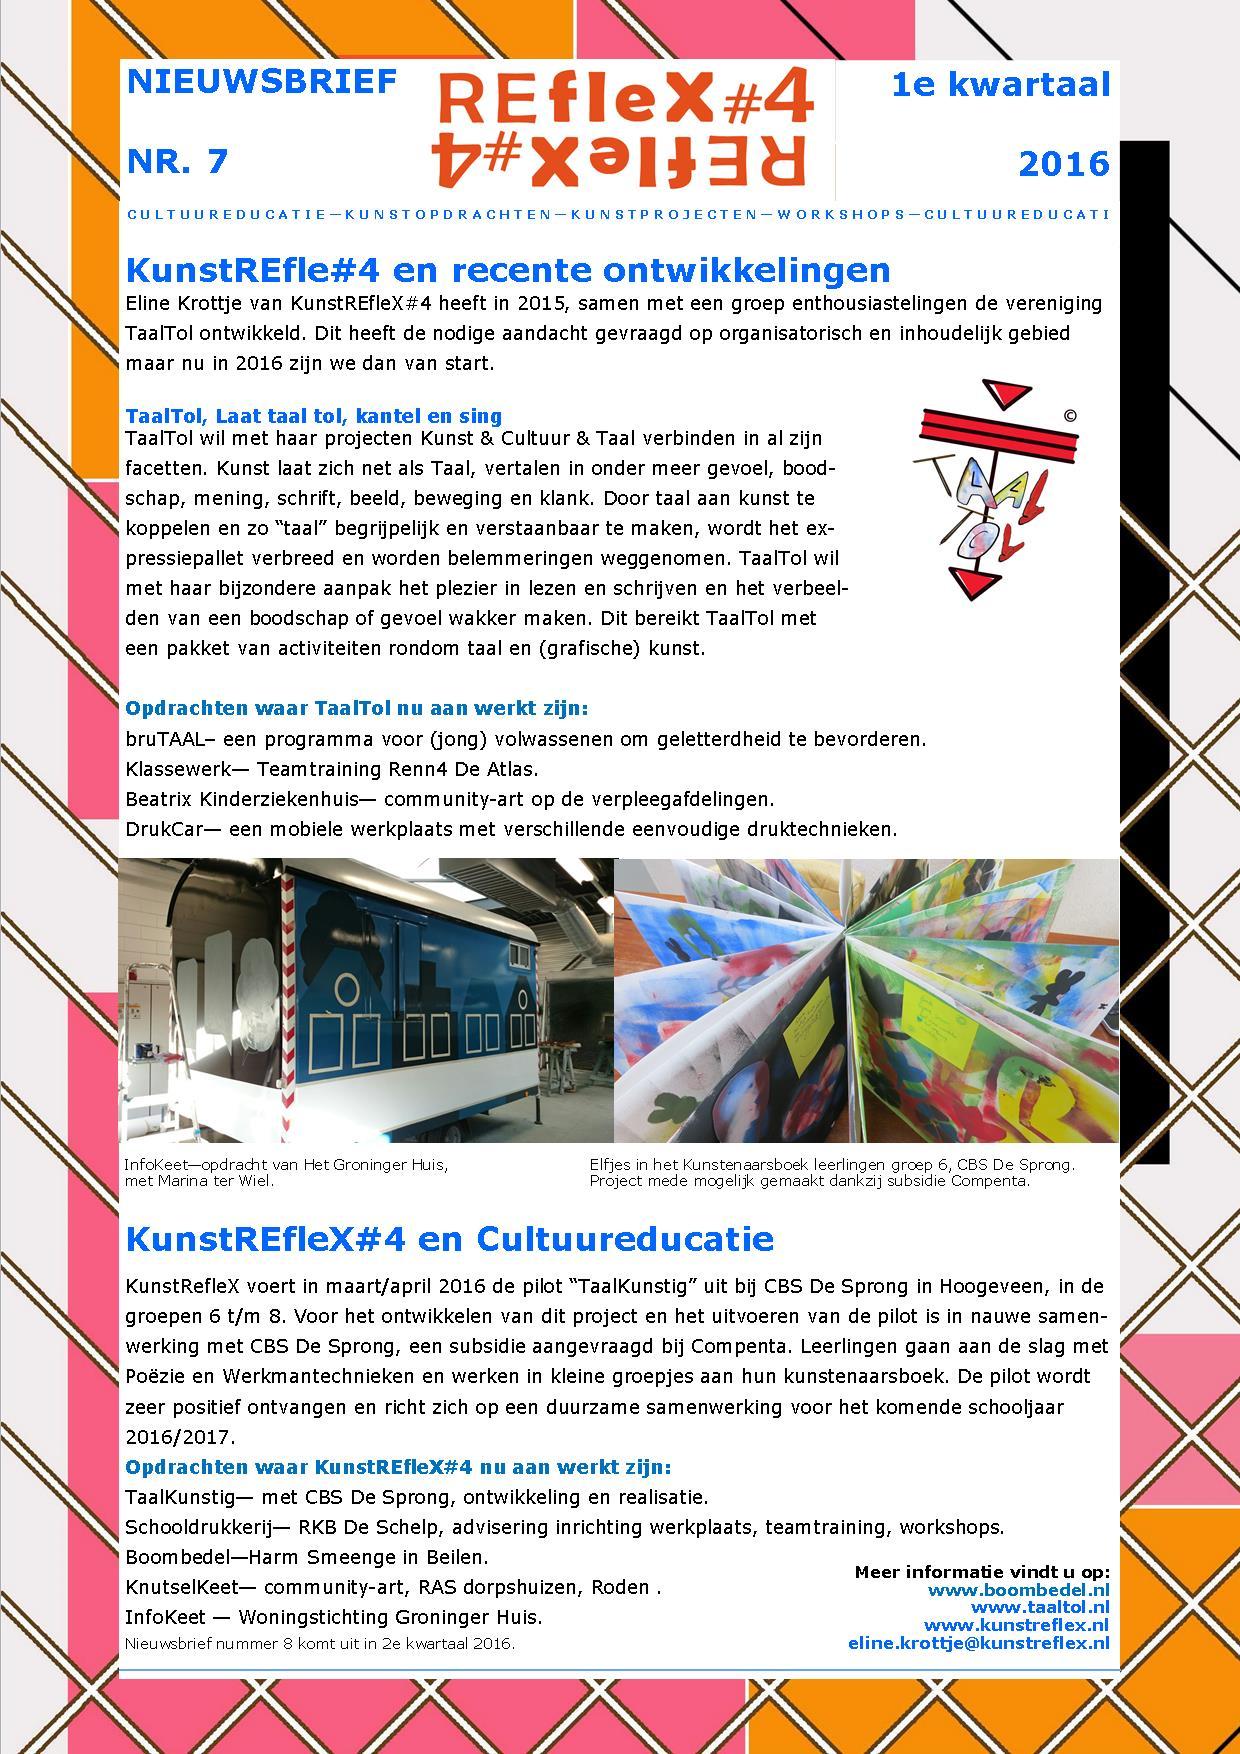 nieuwsbrief KunstREfleX#4, nr 7